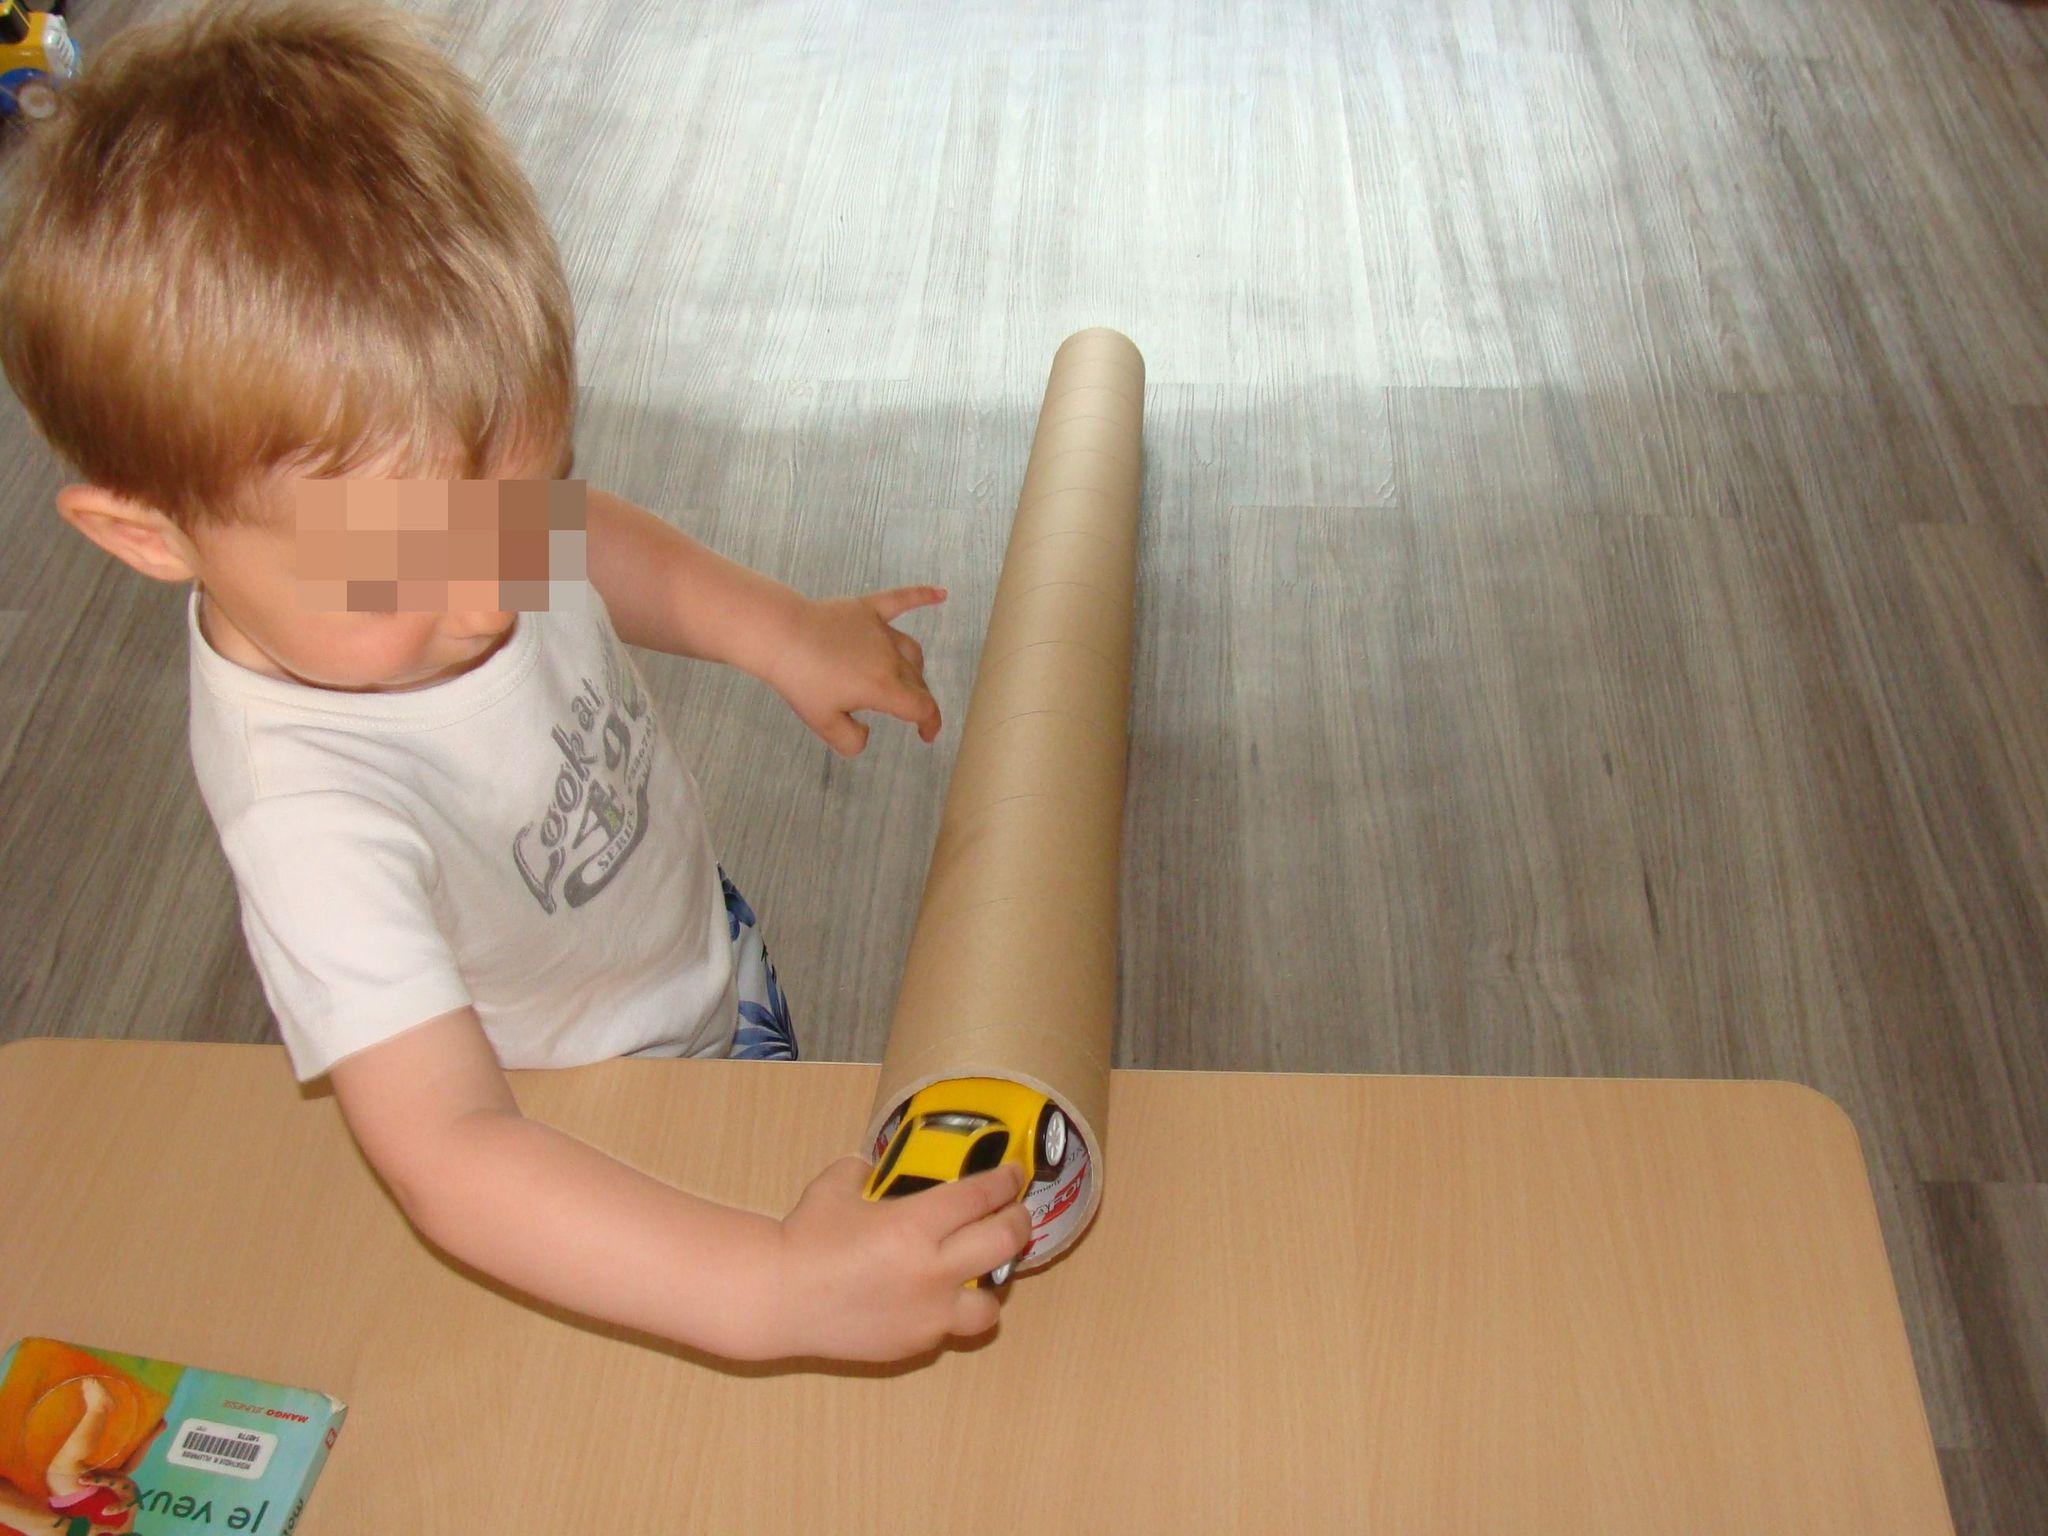 Hervorragend Avec un gros tube en carton. - ribambelles TJ88